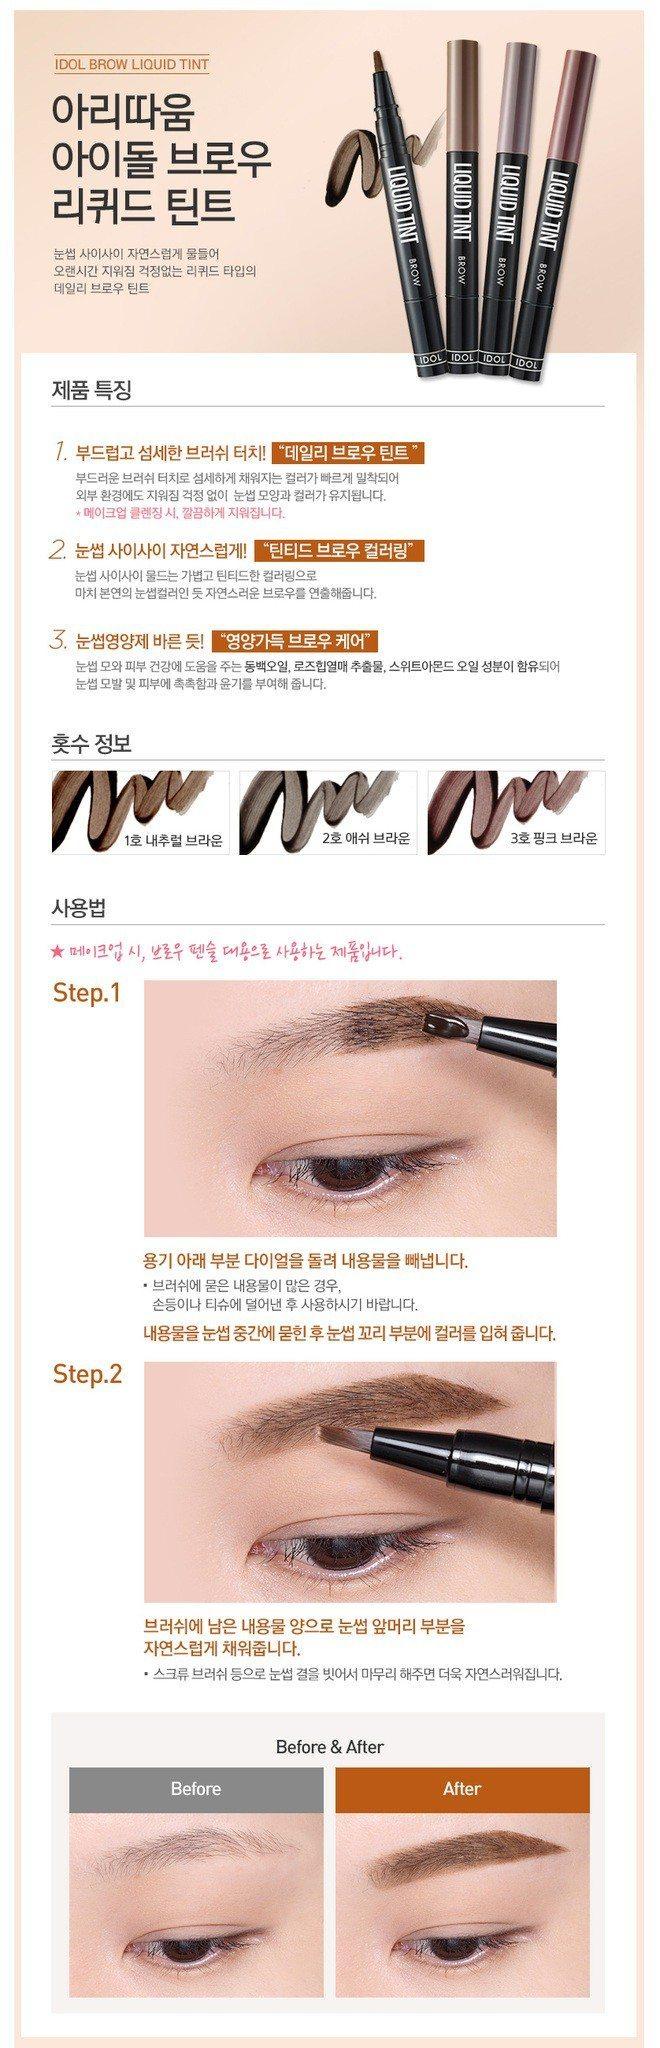 Aritaum IDOL Brow Liquid Tint 1.8g korean cosmetic makeup product online shop malaysia  brunei philippines1